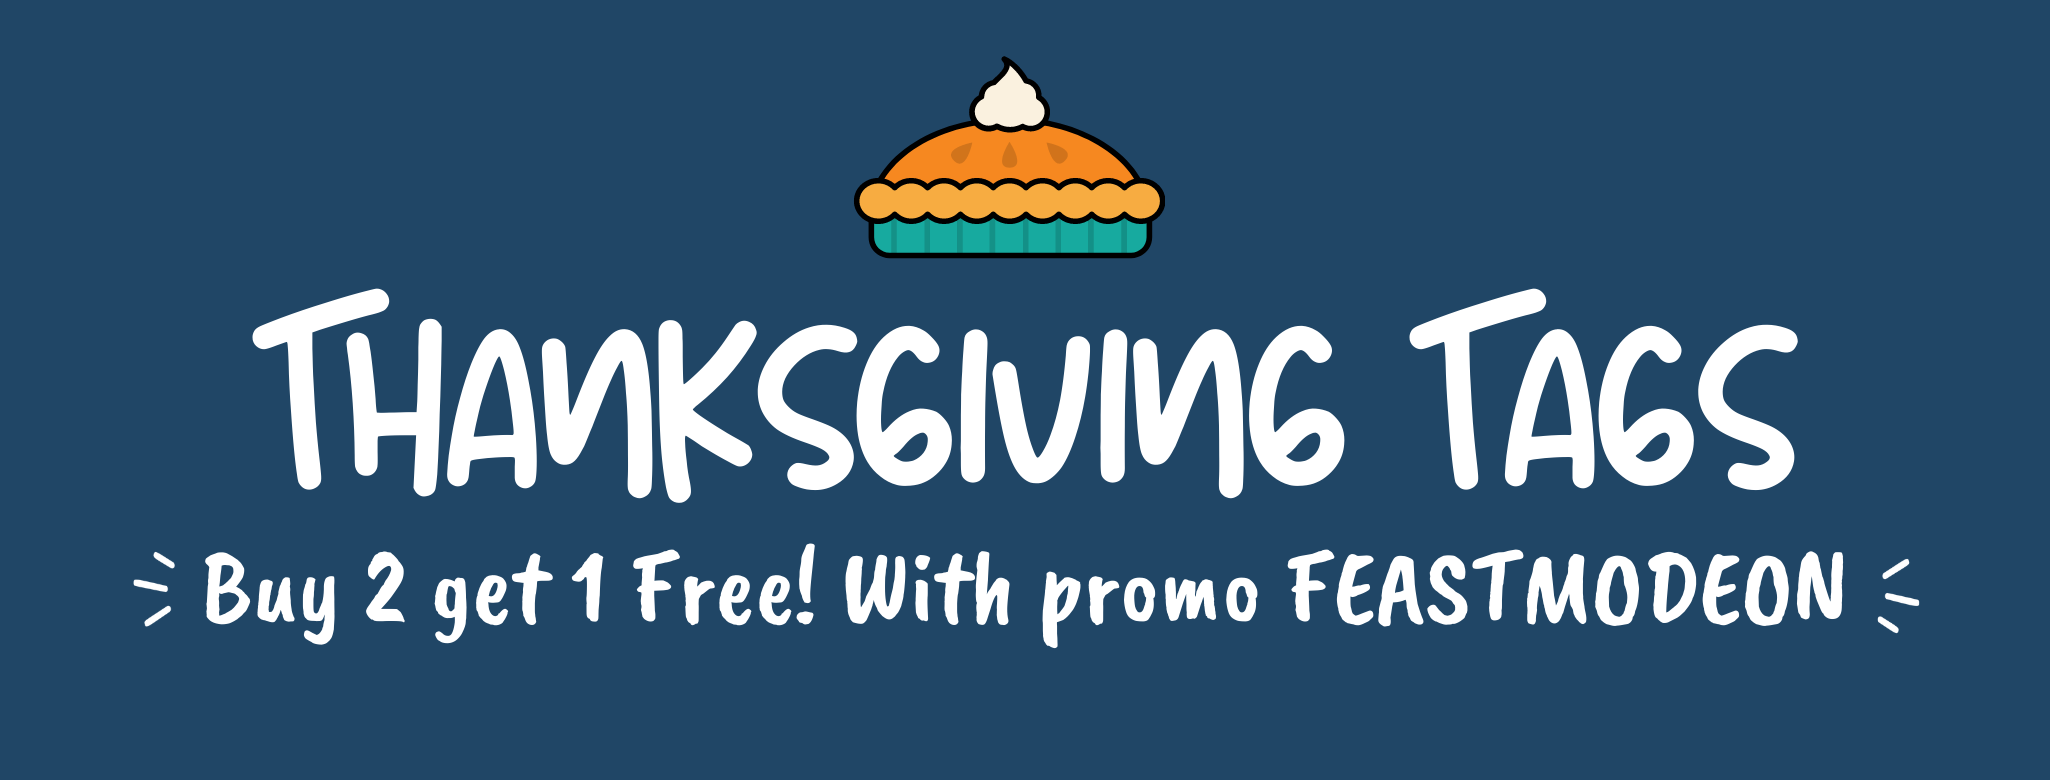 bad-tags-thanksgiving-dog-tags.png